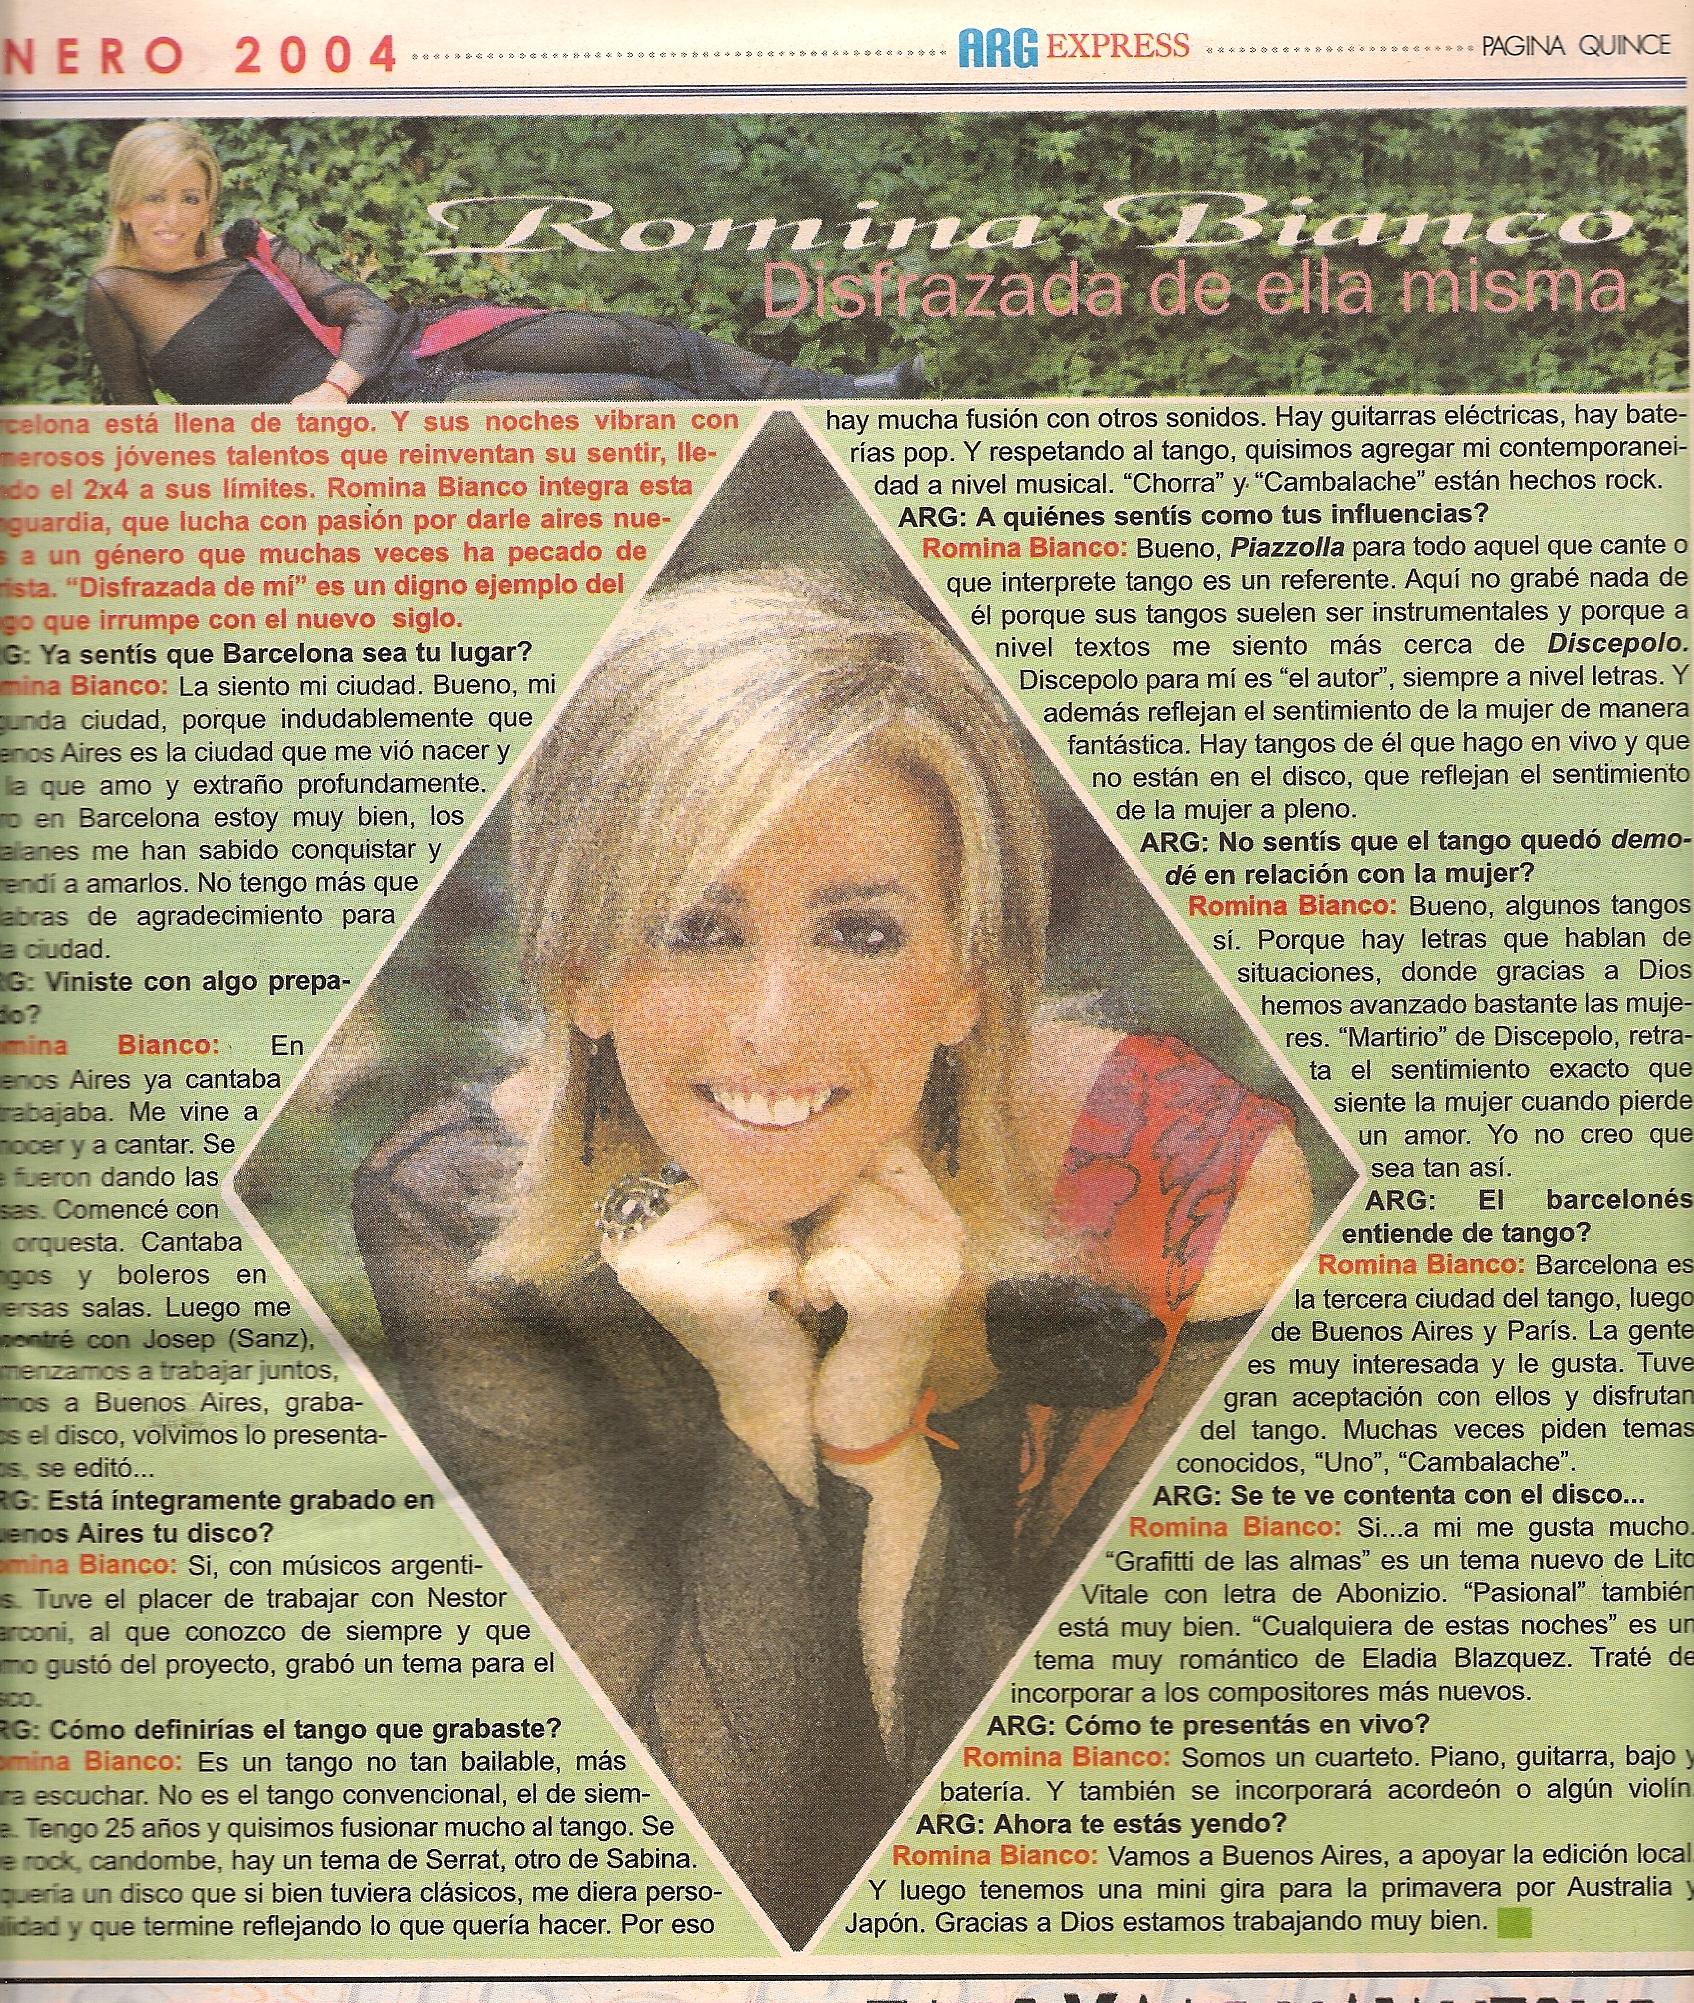 Argentina's Express Magazine